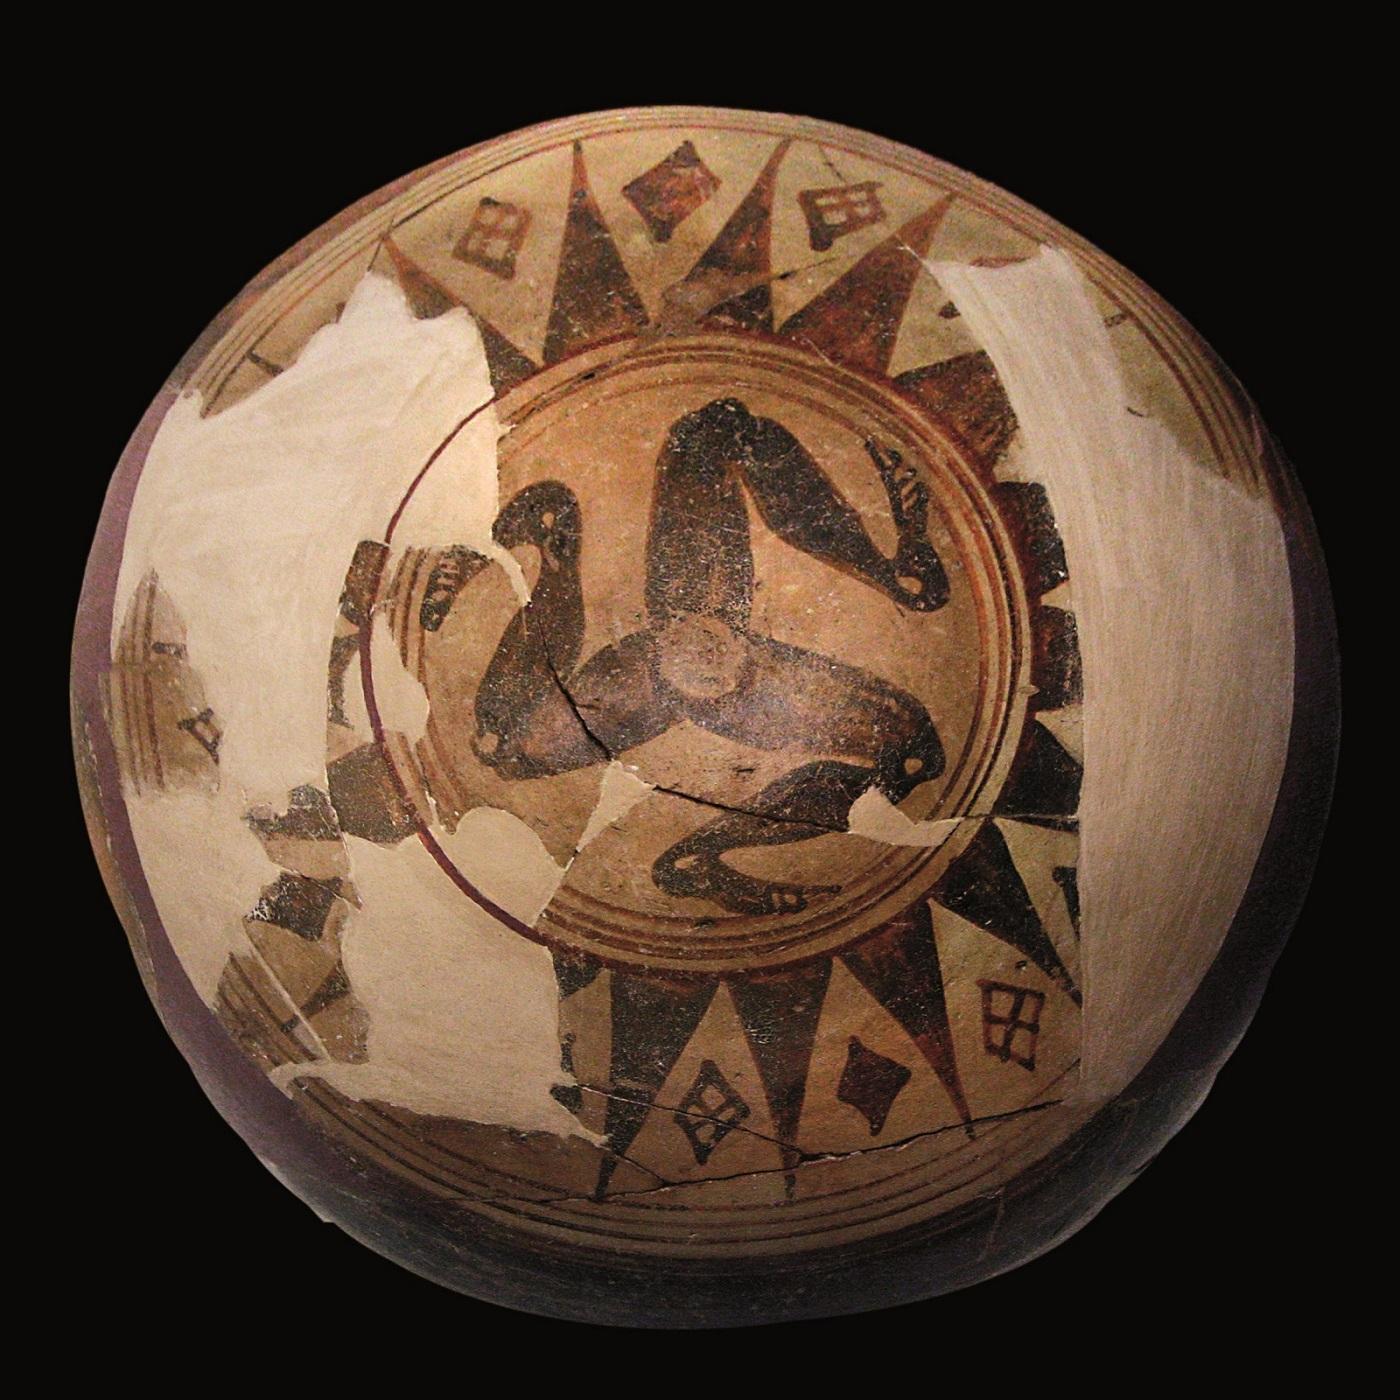 Keramische dinos met triskelion, gebakken klei, Palma di Montechiaro, Sicilië, c.650-600 BC. Museo Archeologico Regionale Di Agrigento © Regione Siciliana